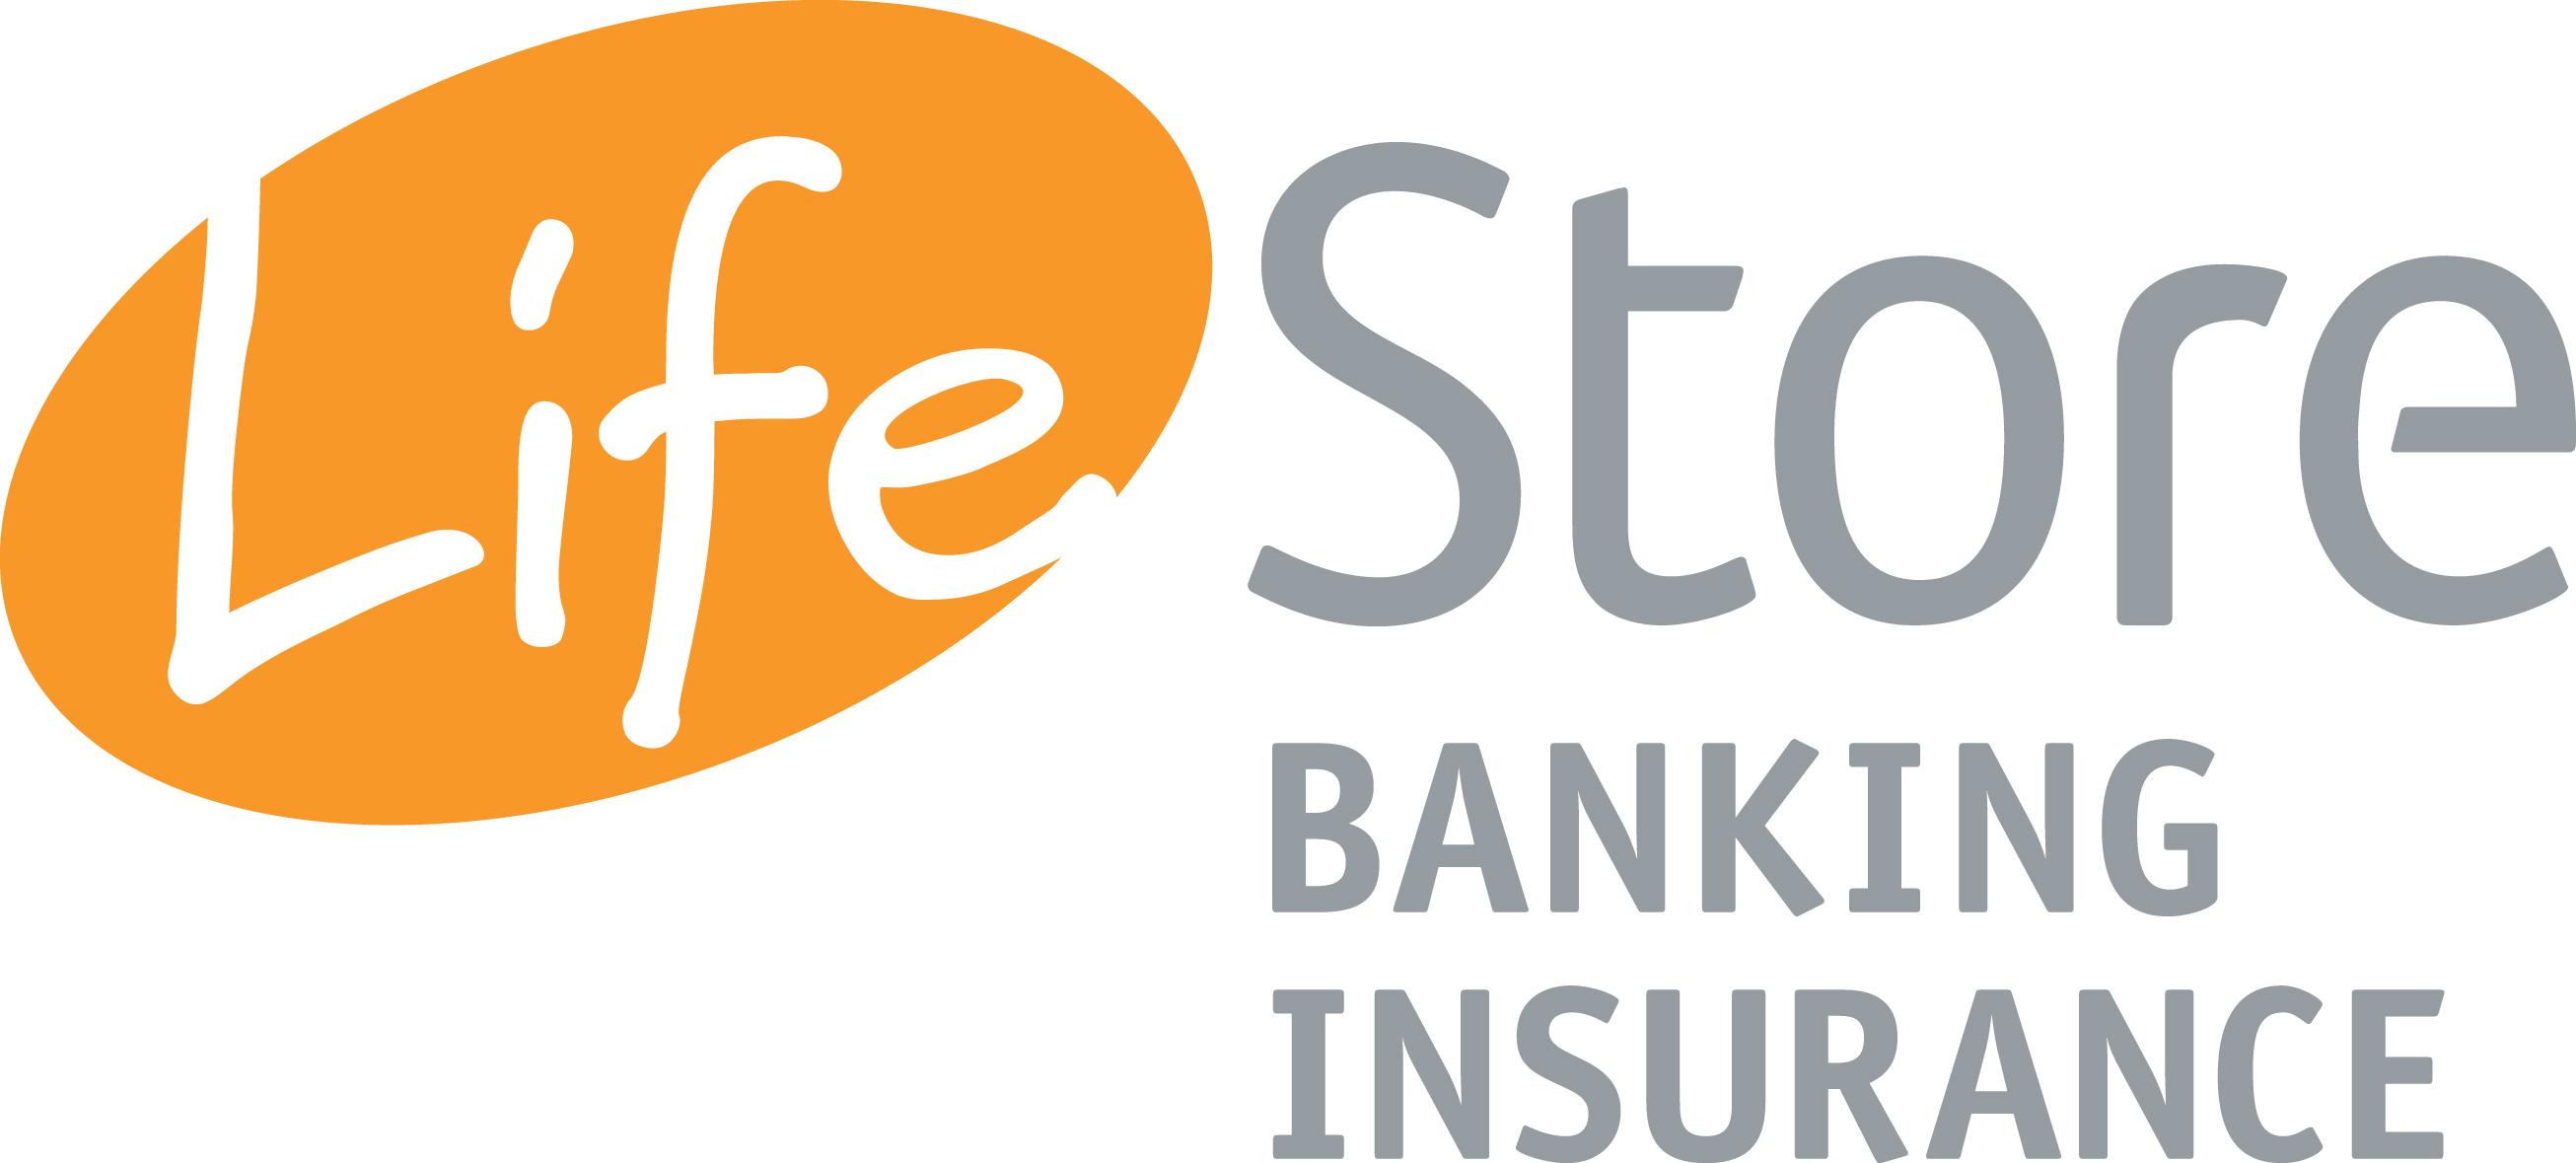 lifestore-logo